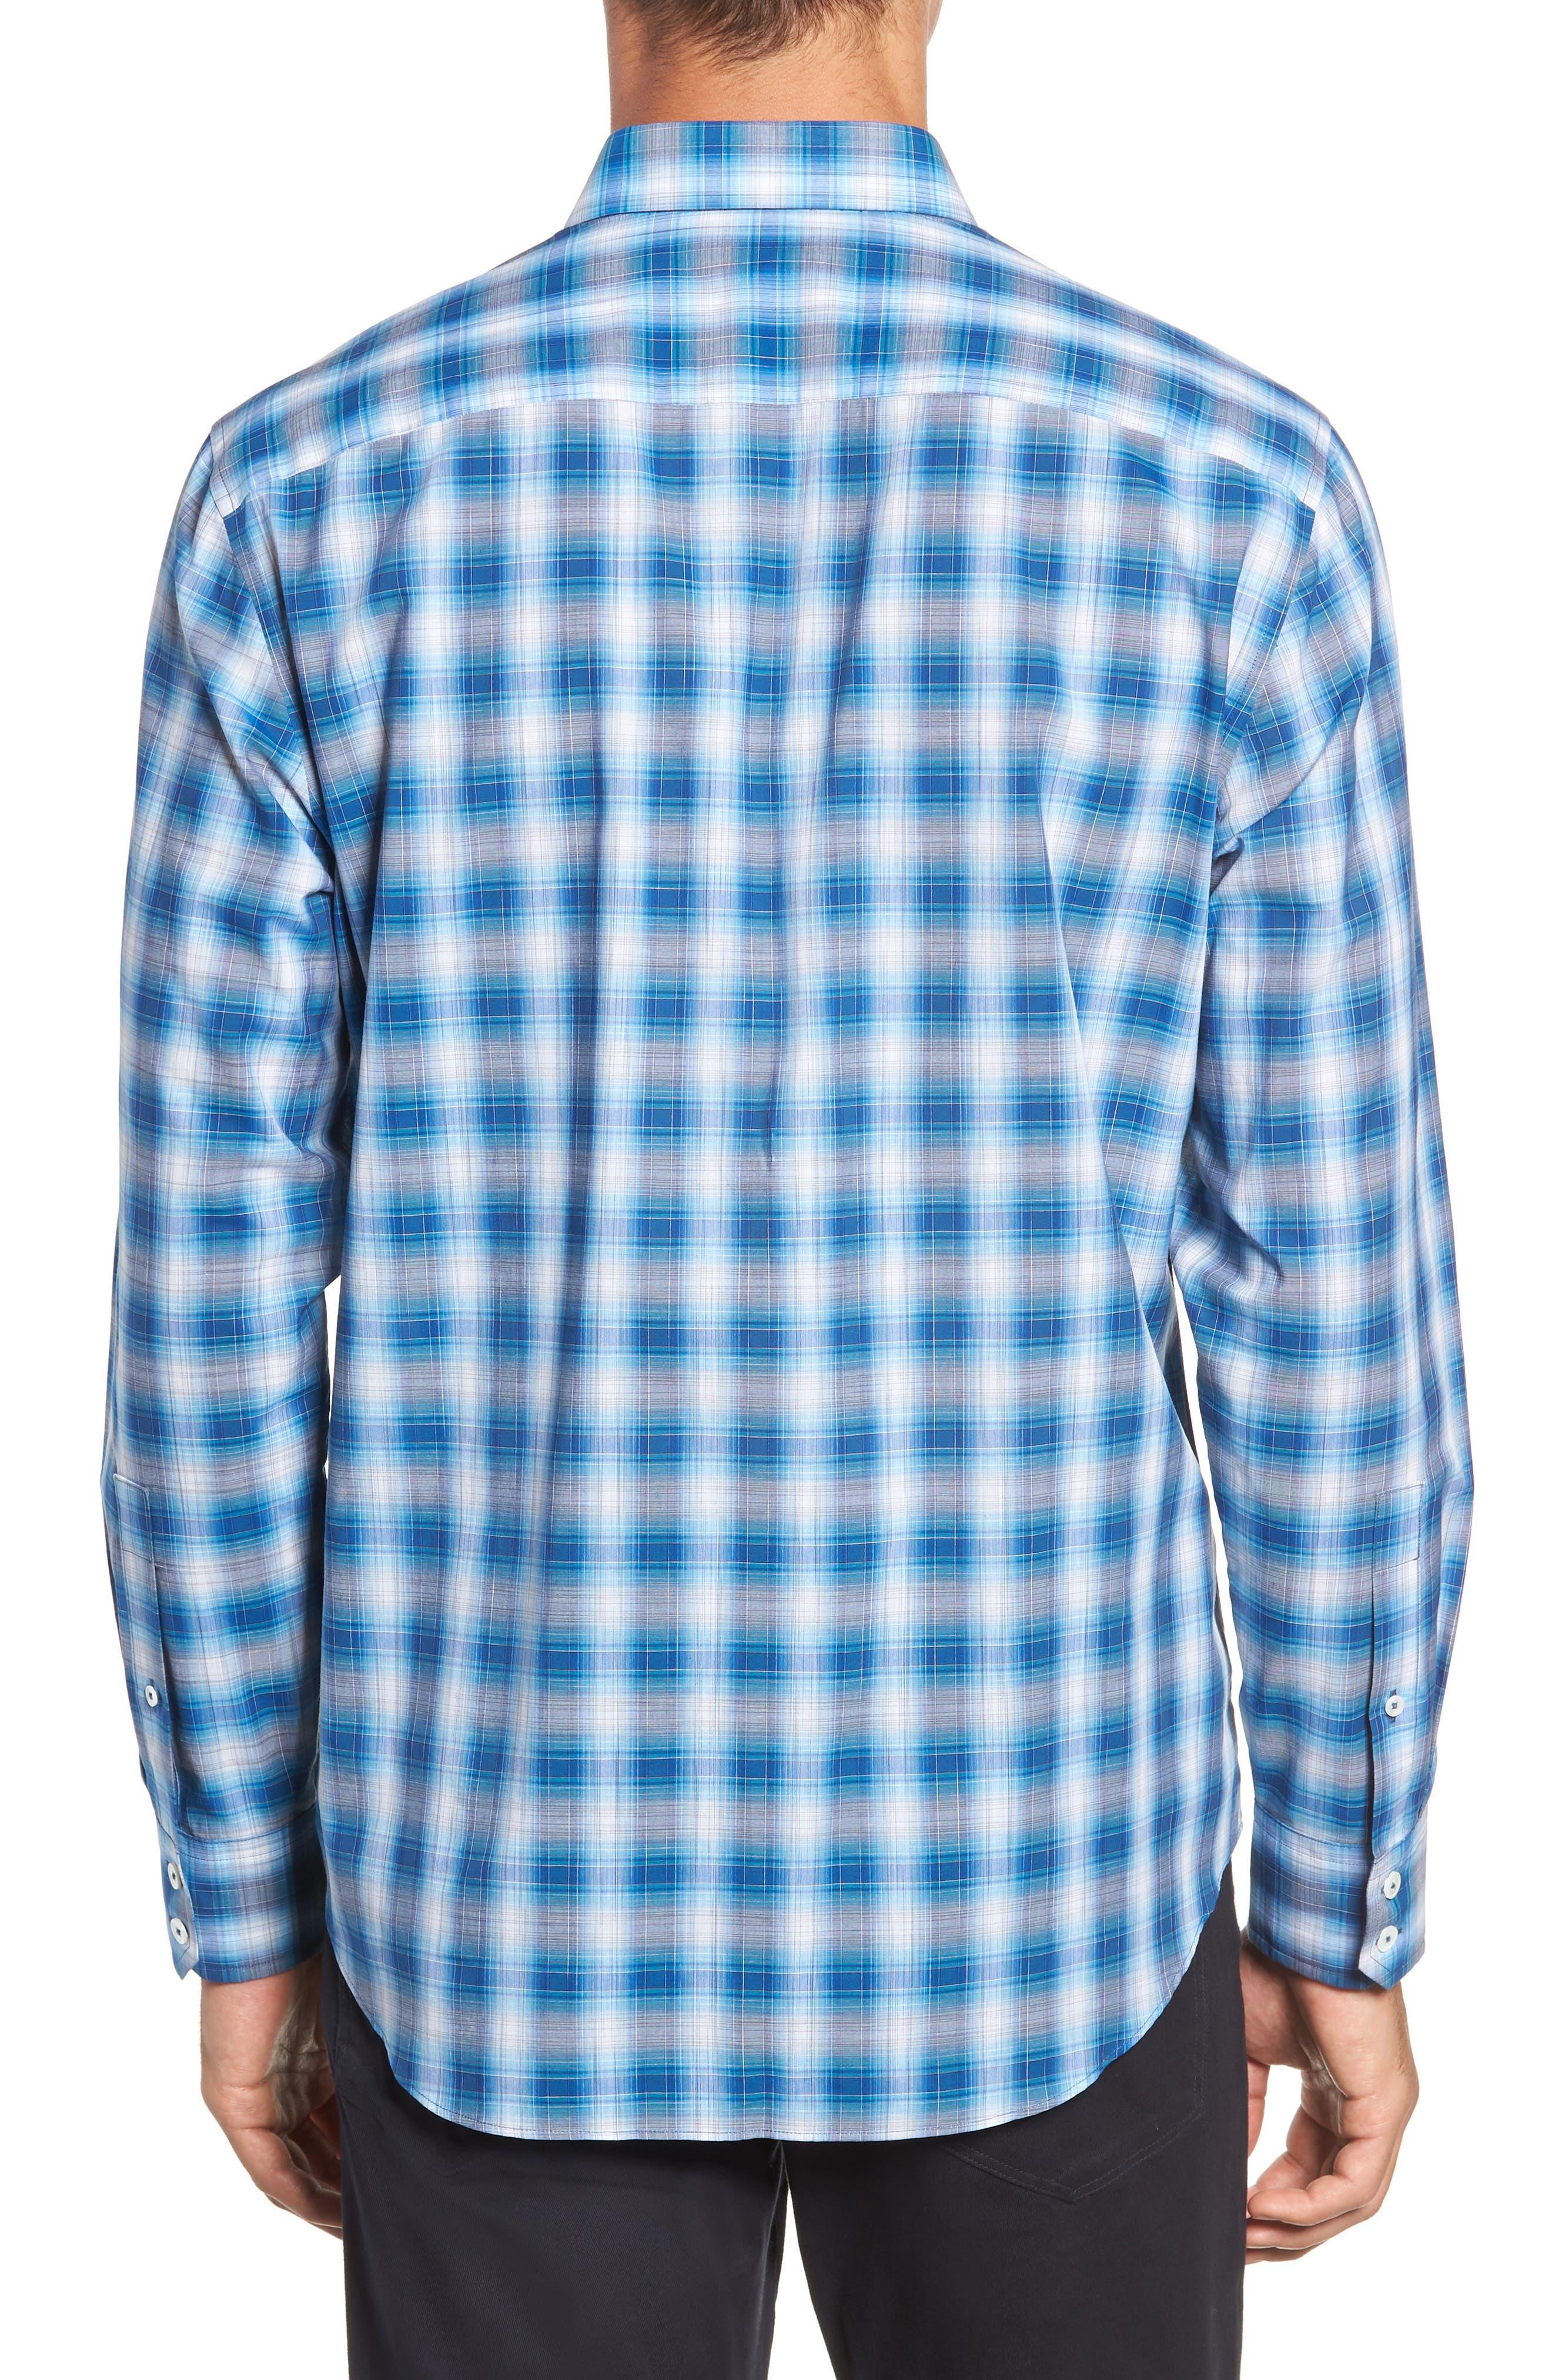 Holtsinger Plaid Sport Shirt,                             Alternate thumbnail 3, color,                             BRIGHT BLUE